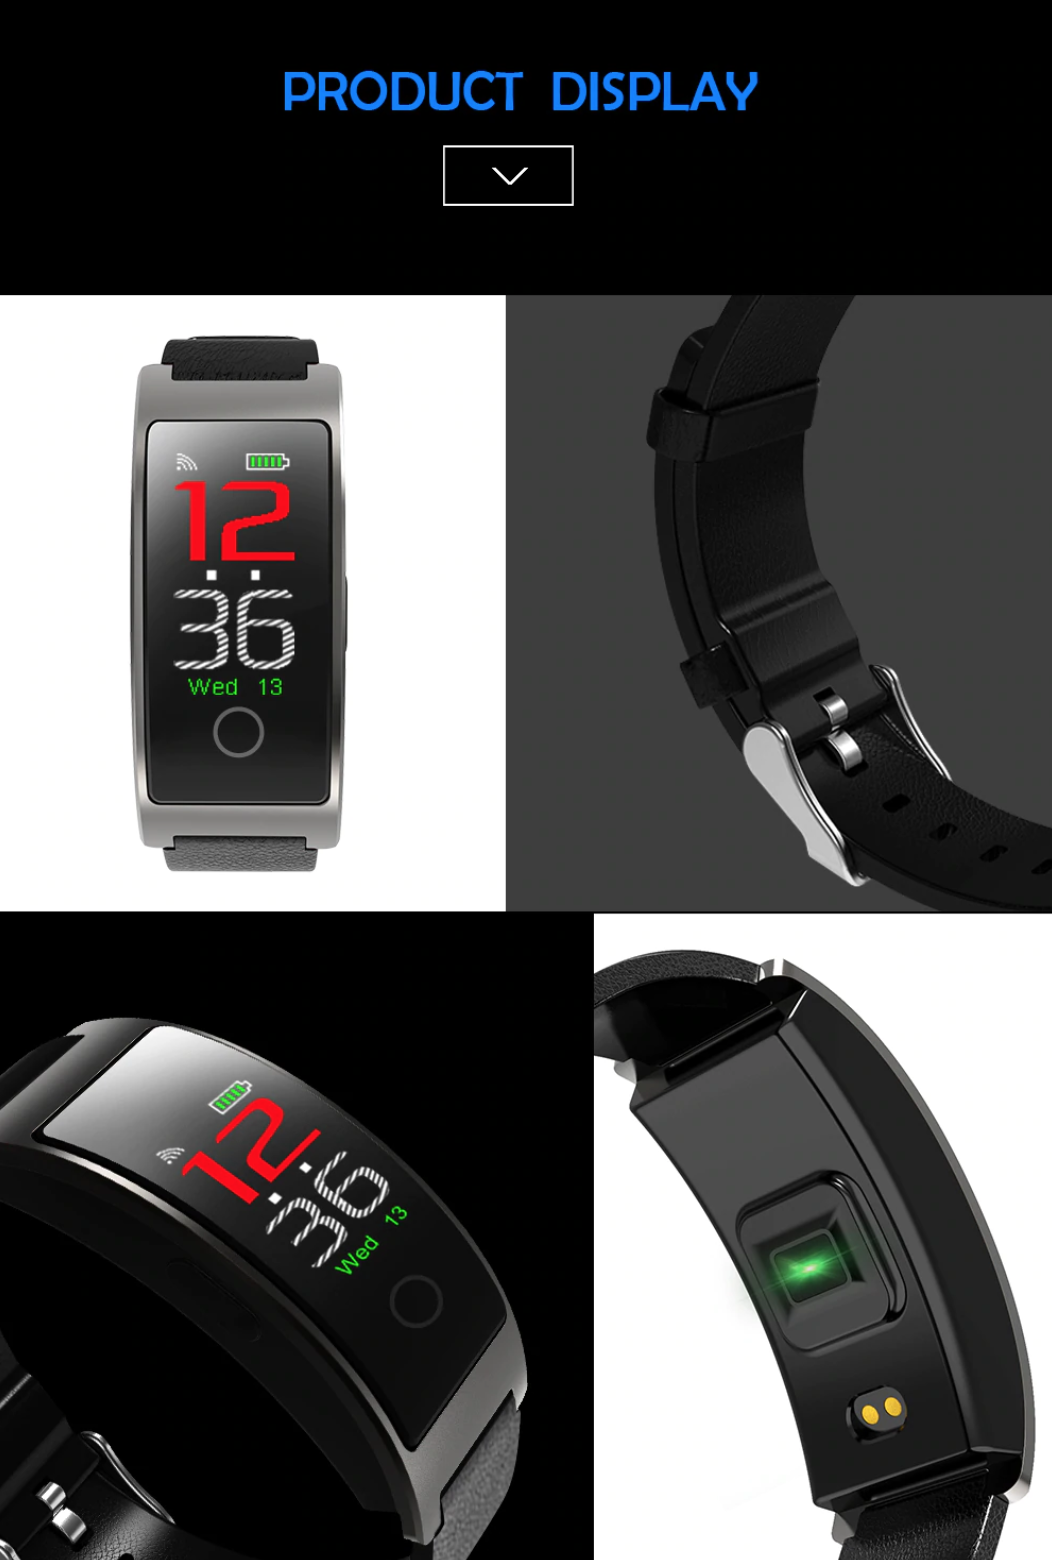 The Best Smart watch in 2019 - Measure Blood Pressure